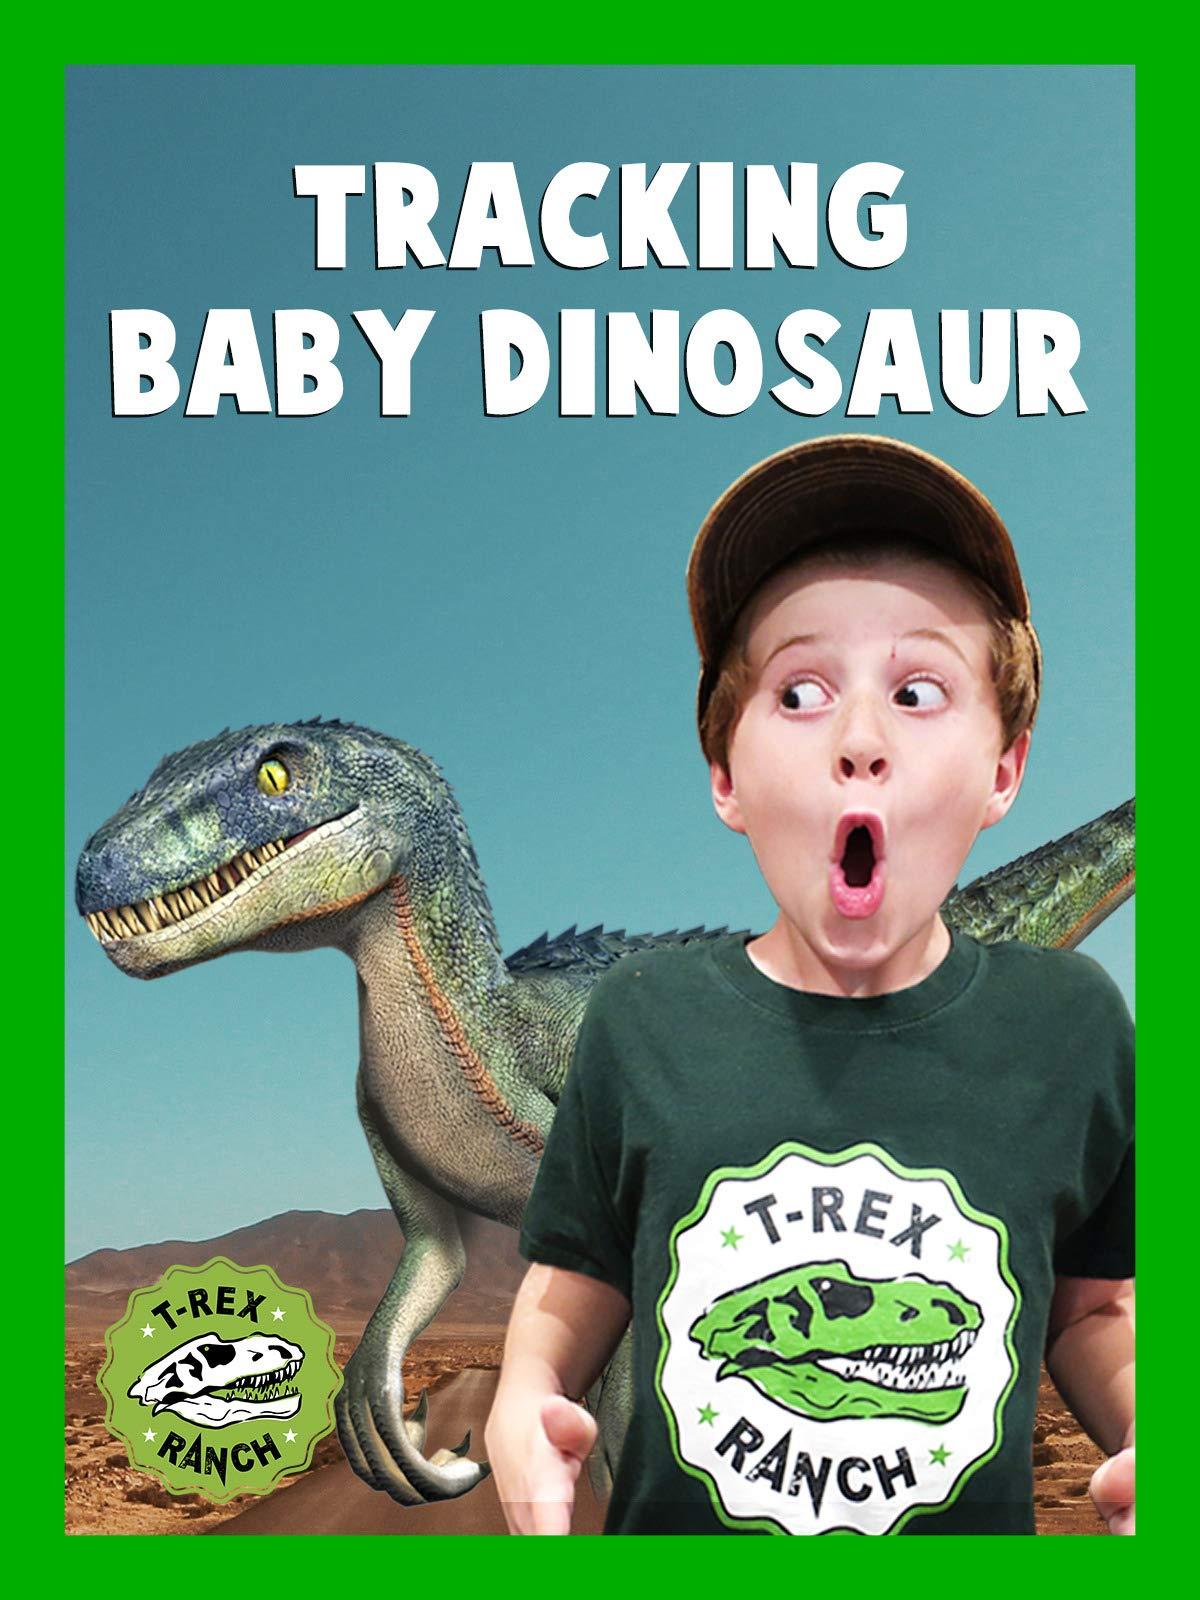 Tracking Baby Dinosaur T-Rex Ranch